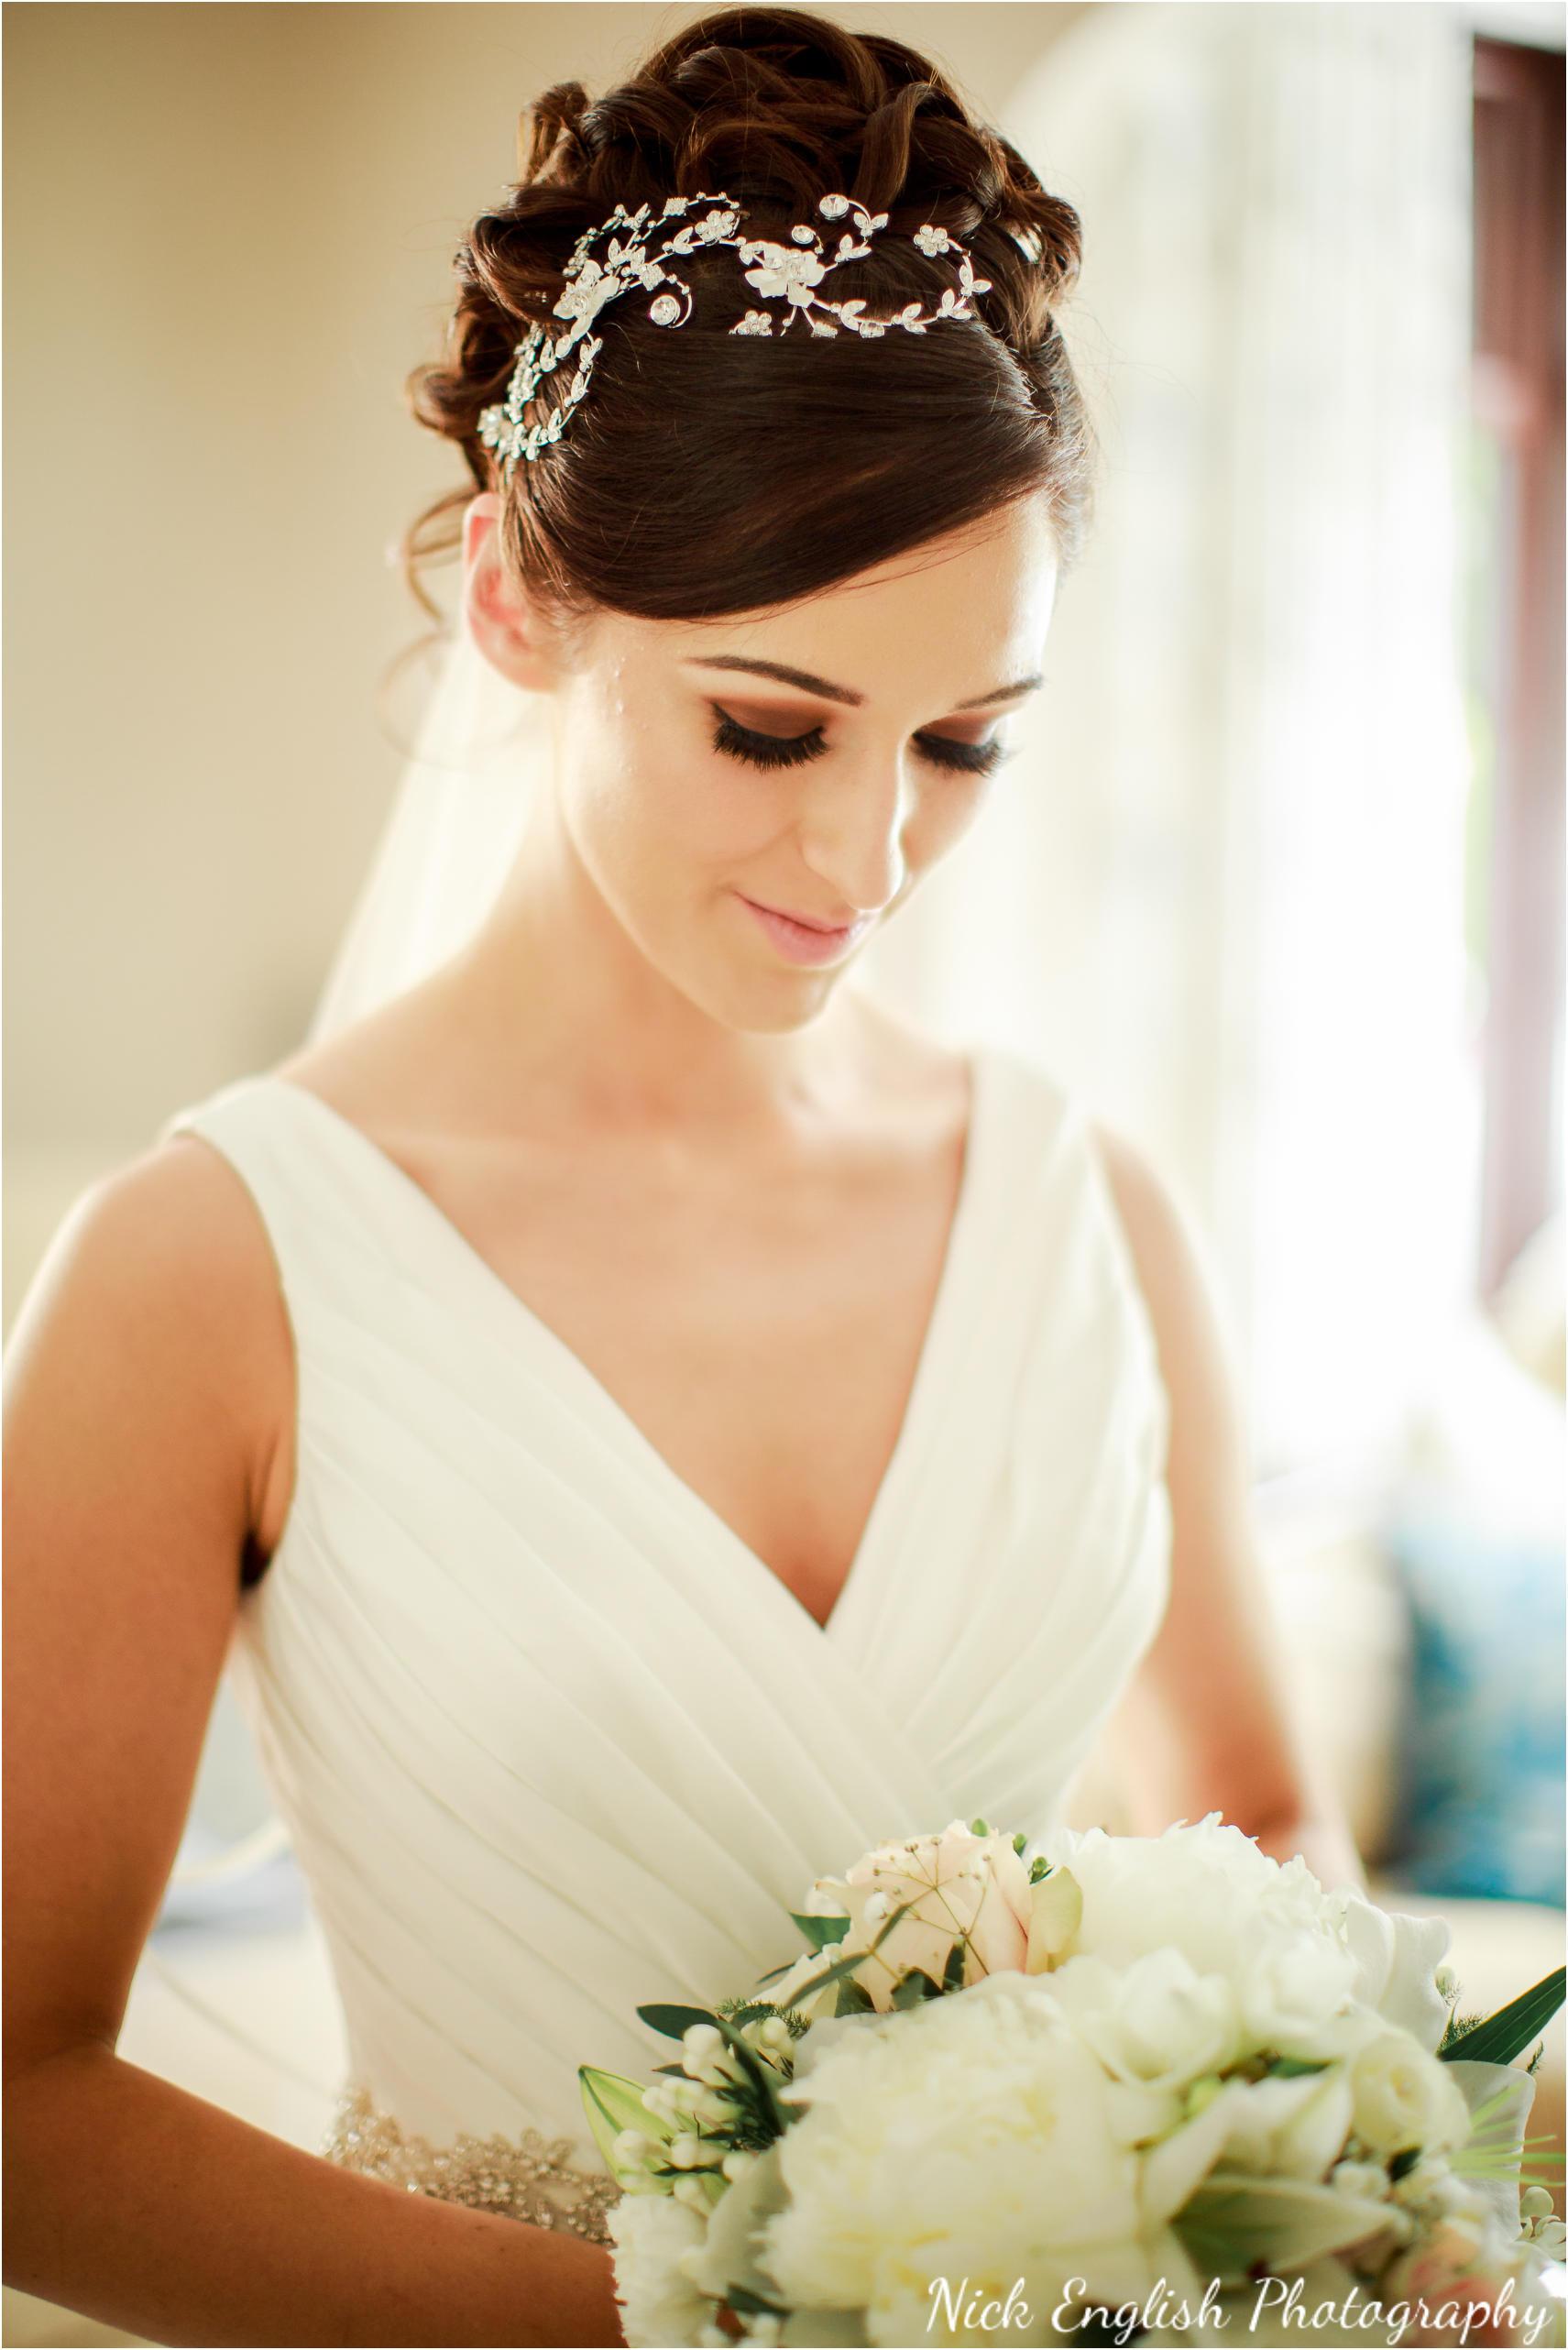 Emily David Wedding Photographs at Barton Grange Preston by Nick English Photography 35jpg.jpeg